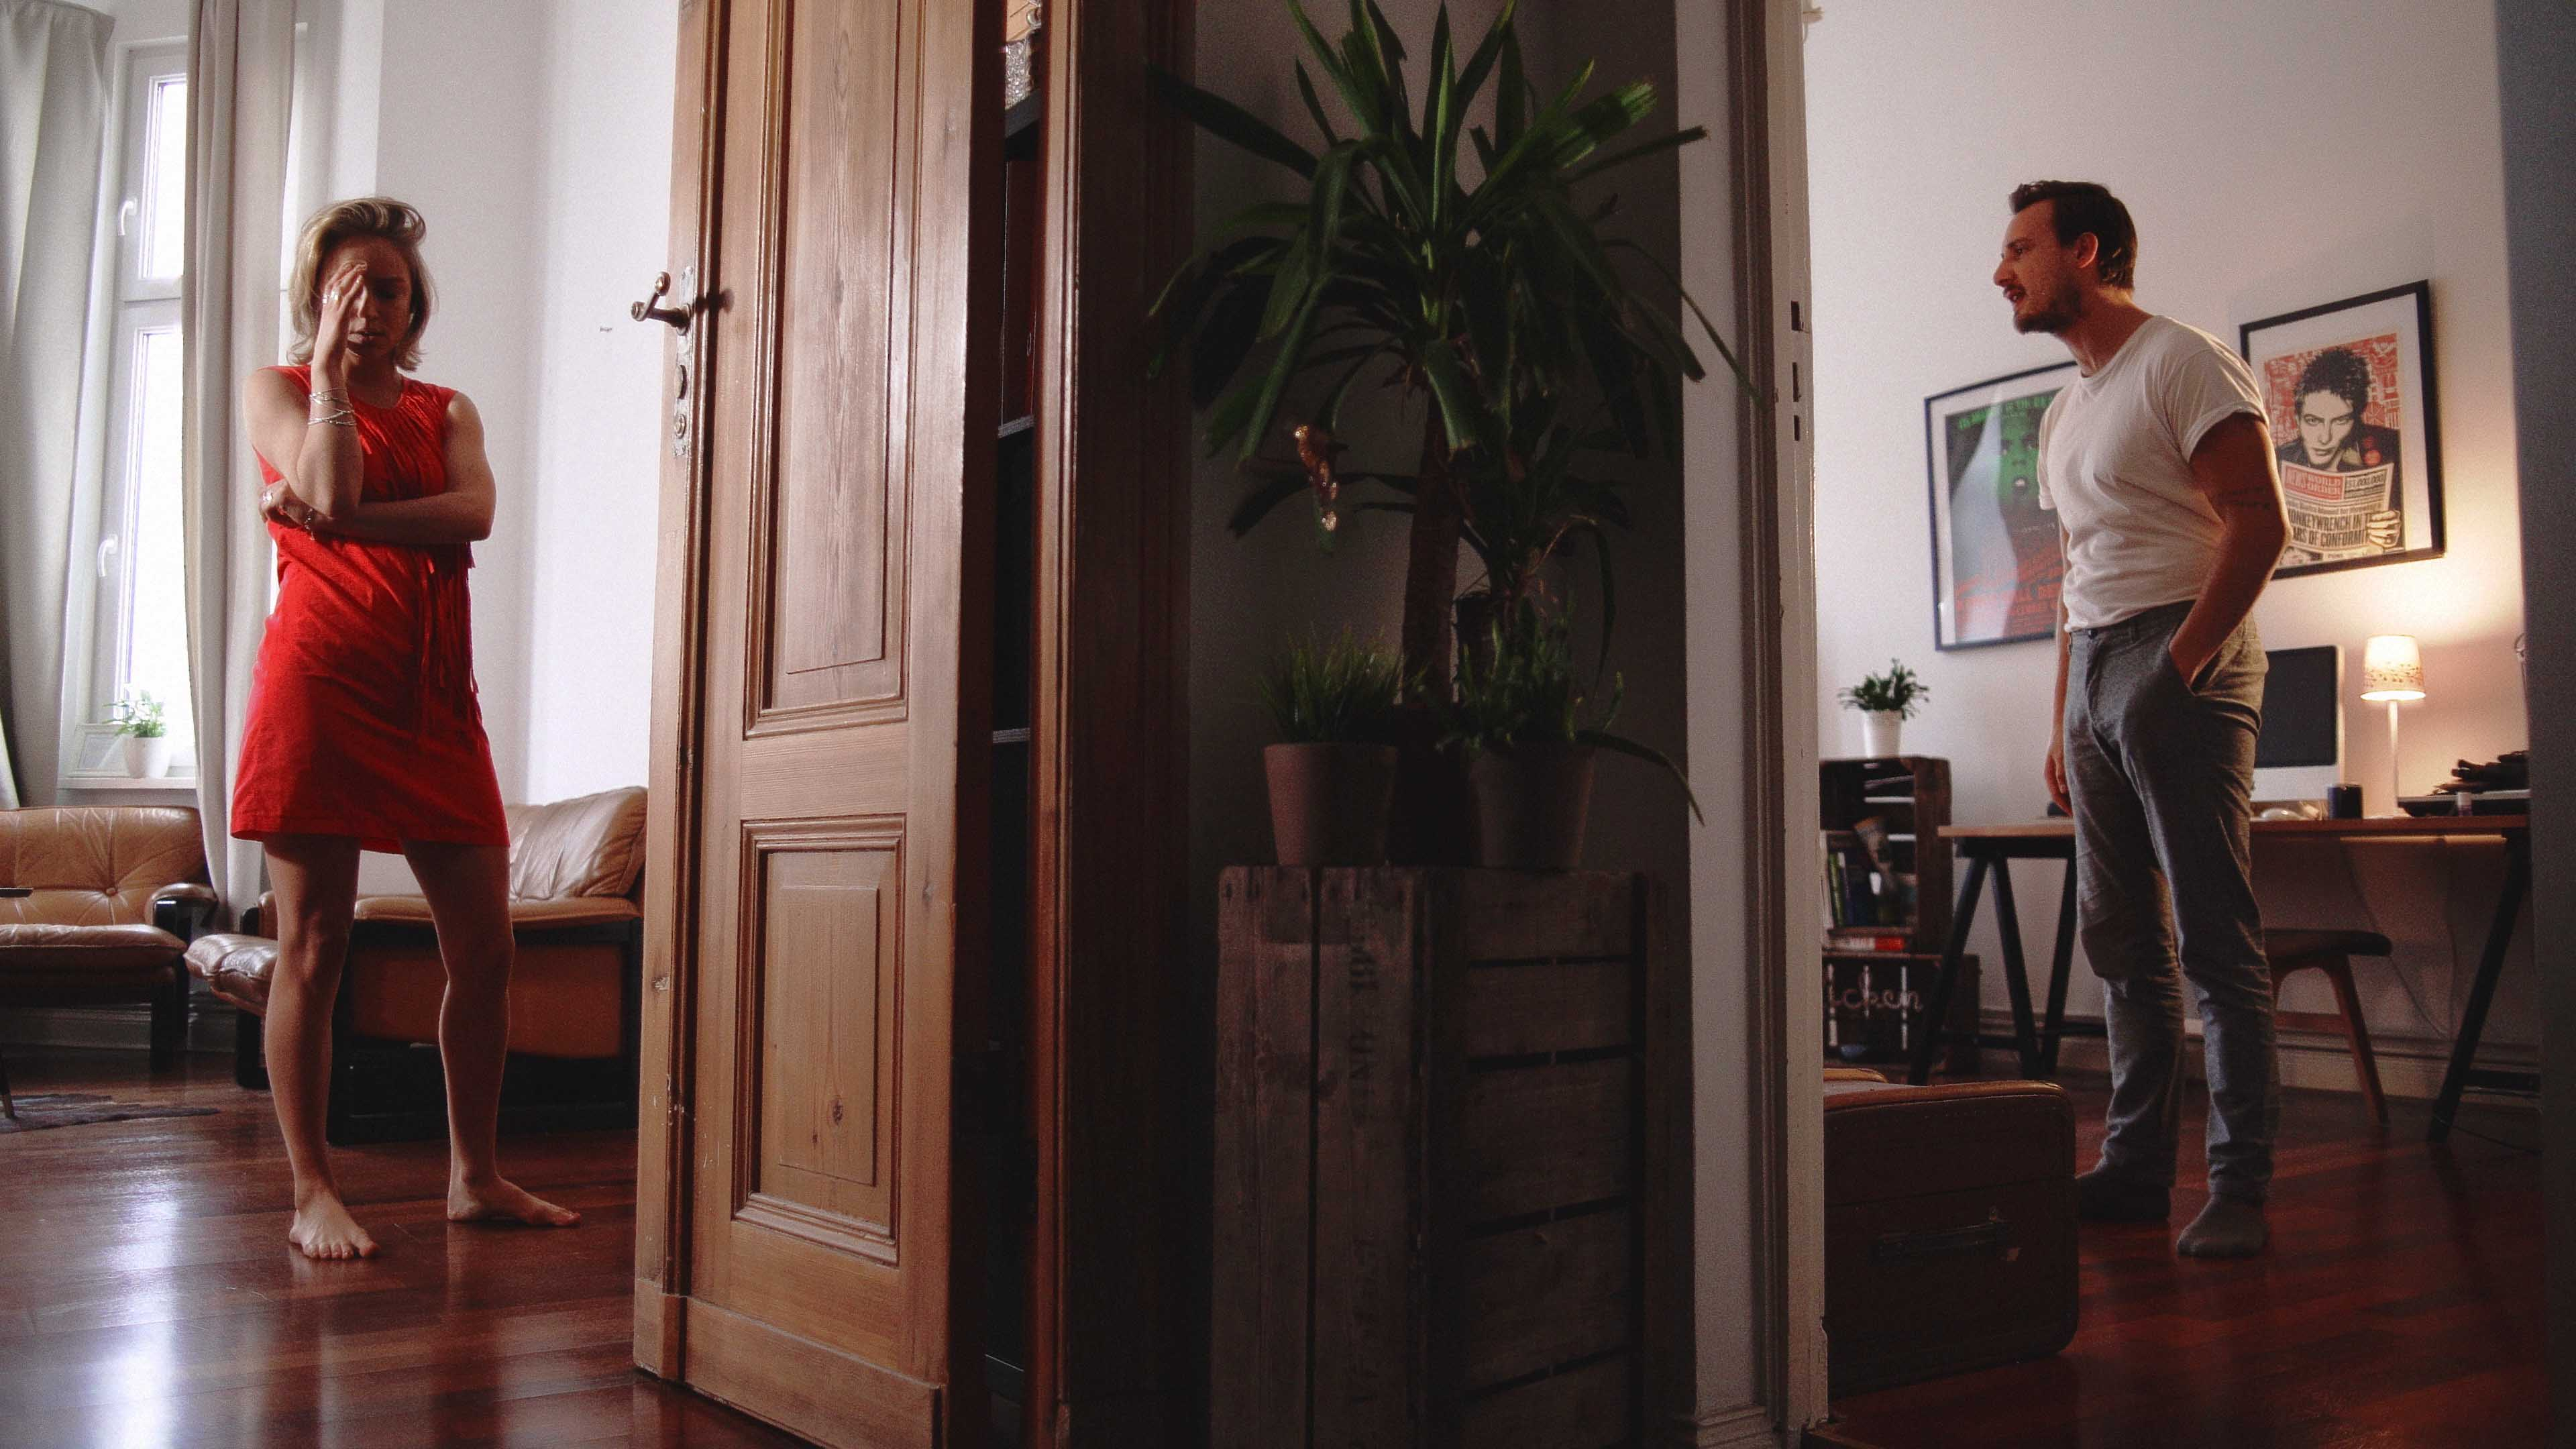 ANDREJ FILATOW Merlin – Sekundenkleber